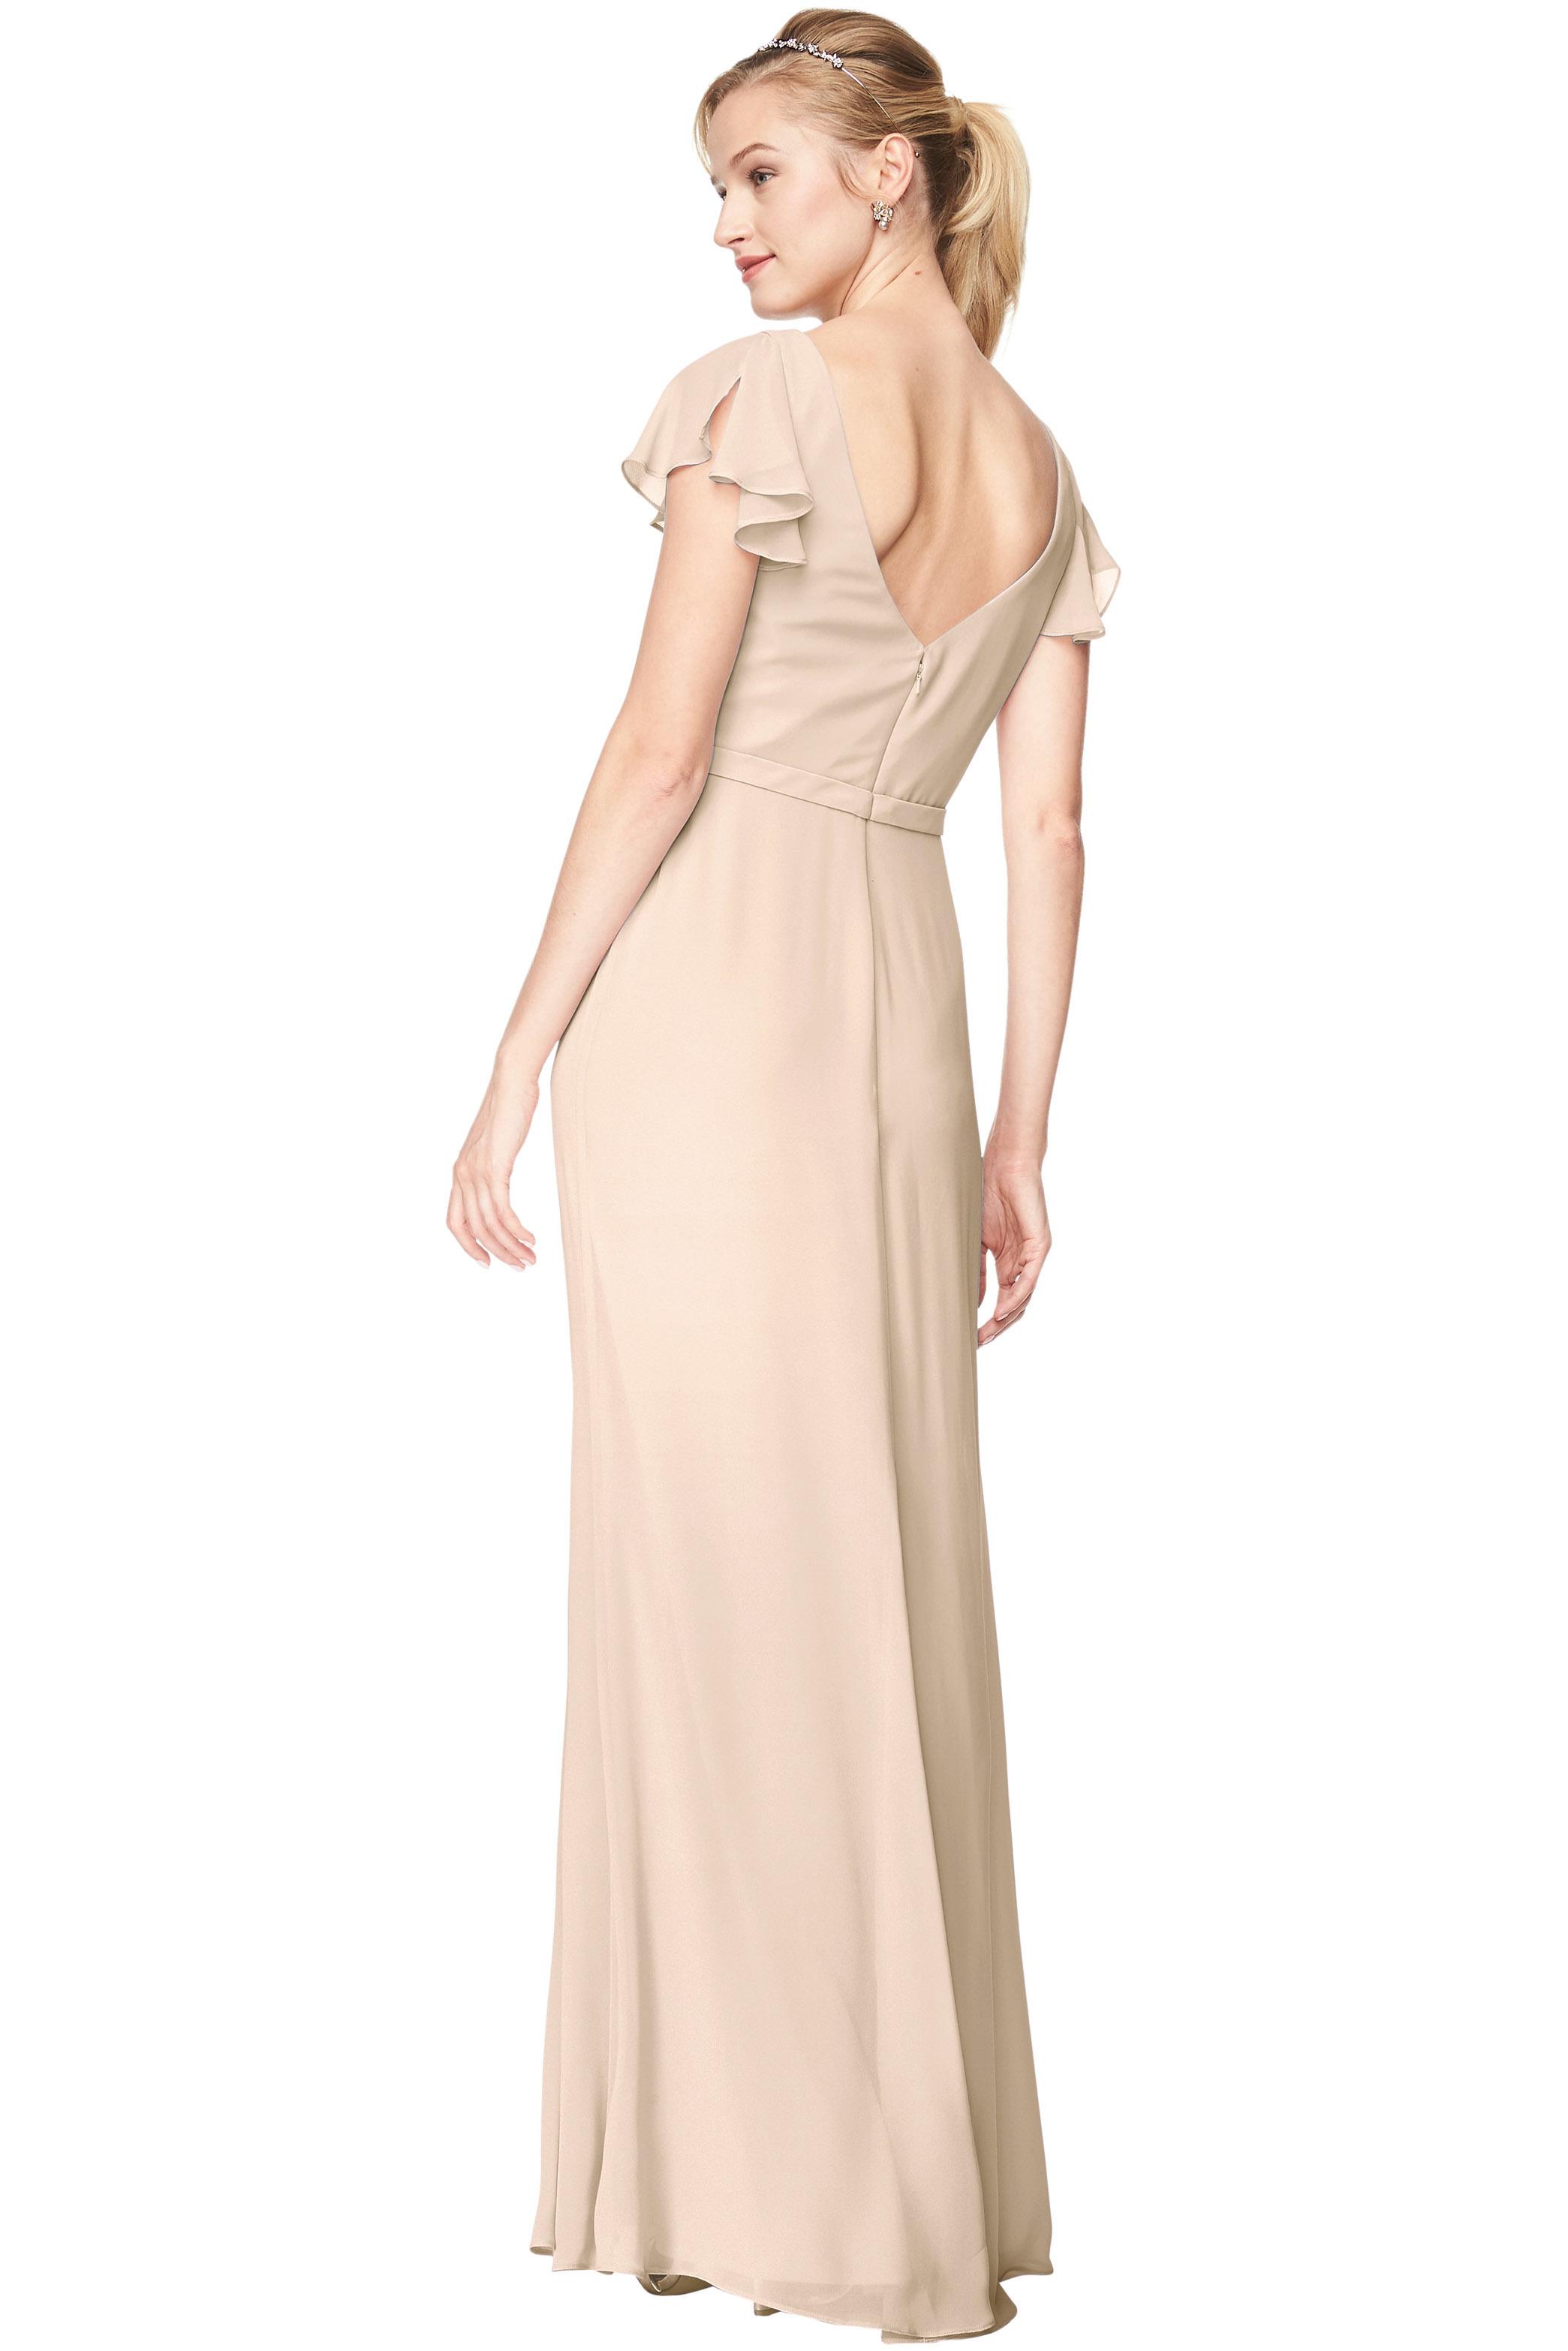 Bill Levkoff CHAMPAGNE Chiffon V-Neck A-Line gown, $184.00 Back